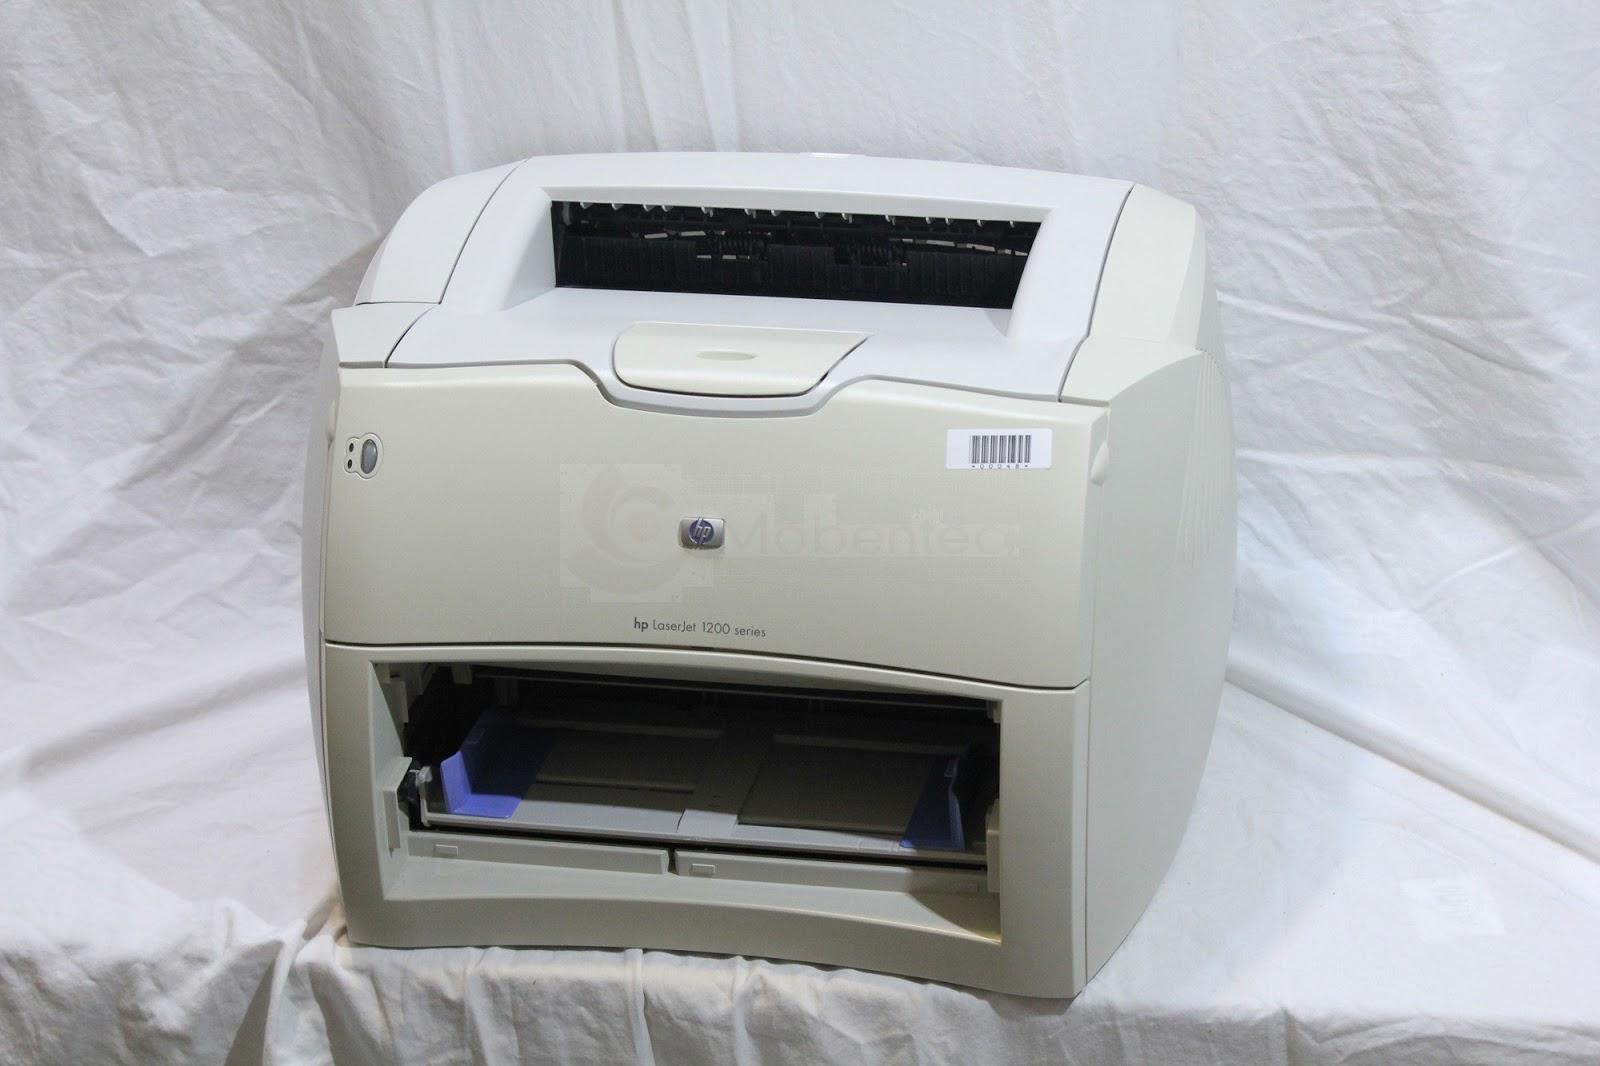 HP Laserjet 1200 Printer Driver Windows - DOWNLOAD FREE ...